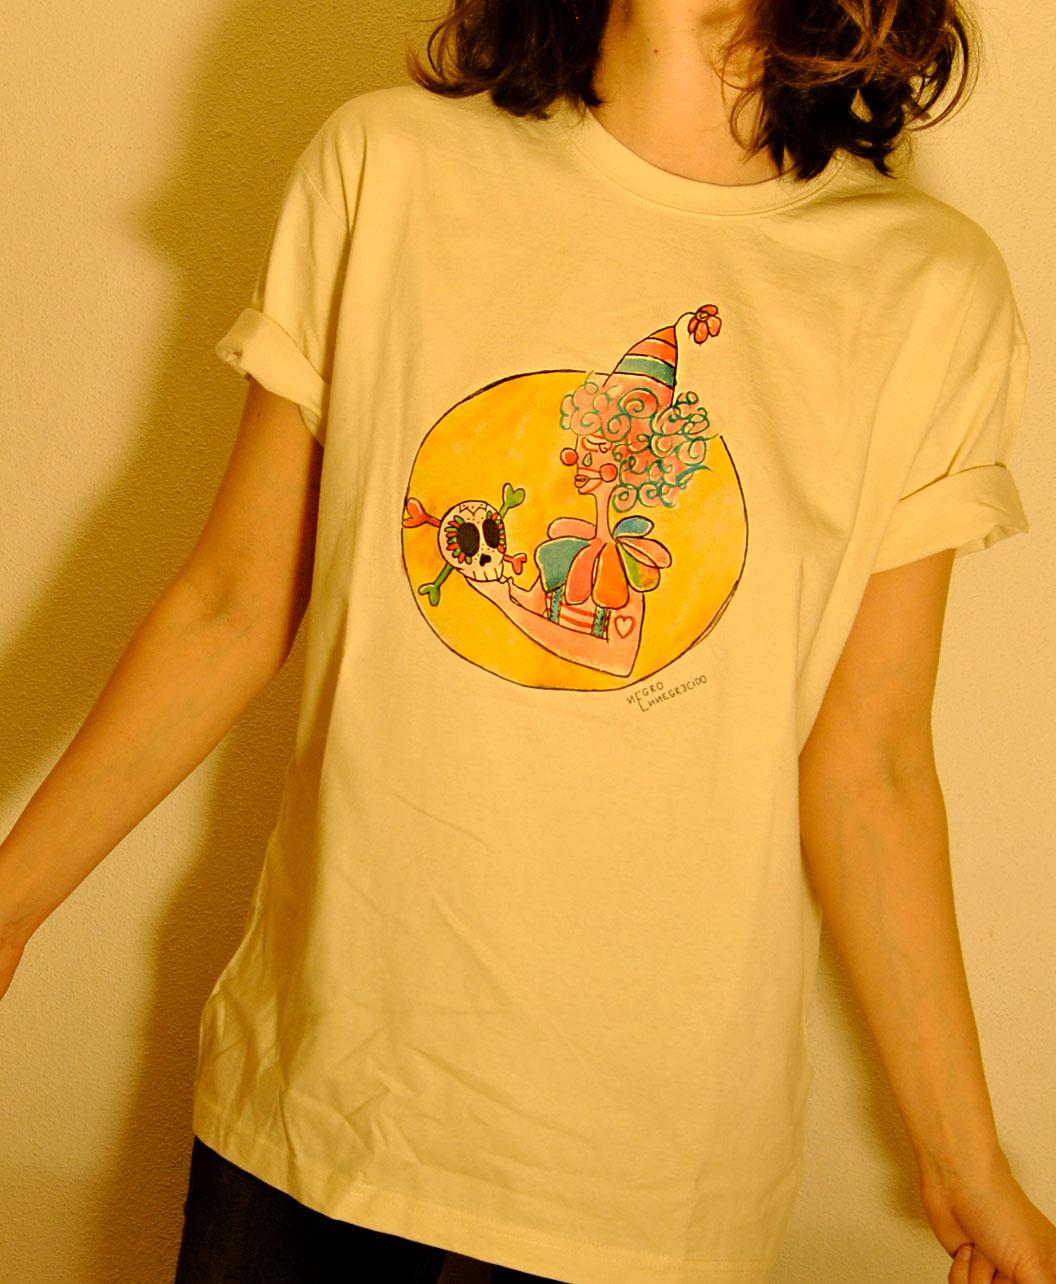 camiseta adulto unisex manga corta originales diferentes con dibujo payaso